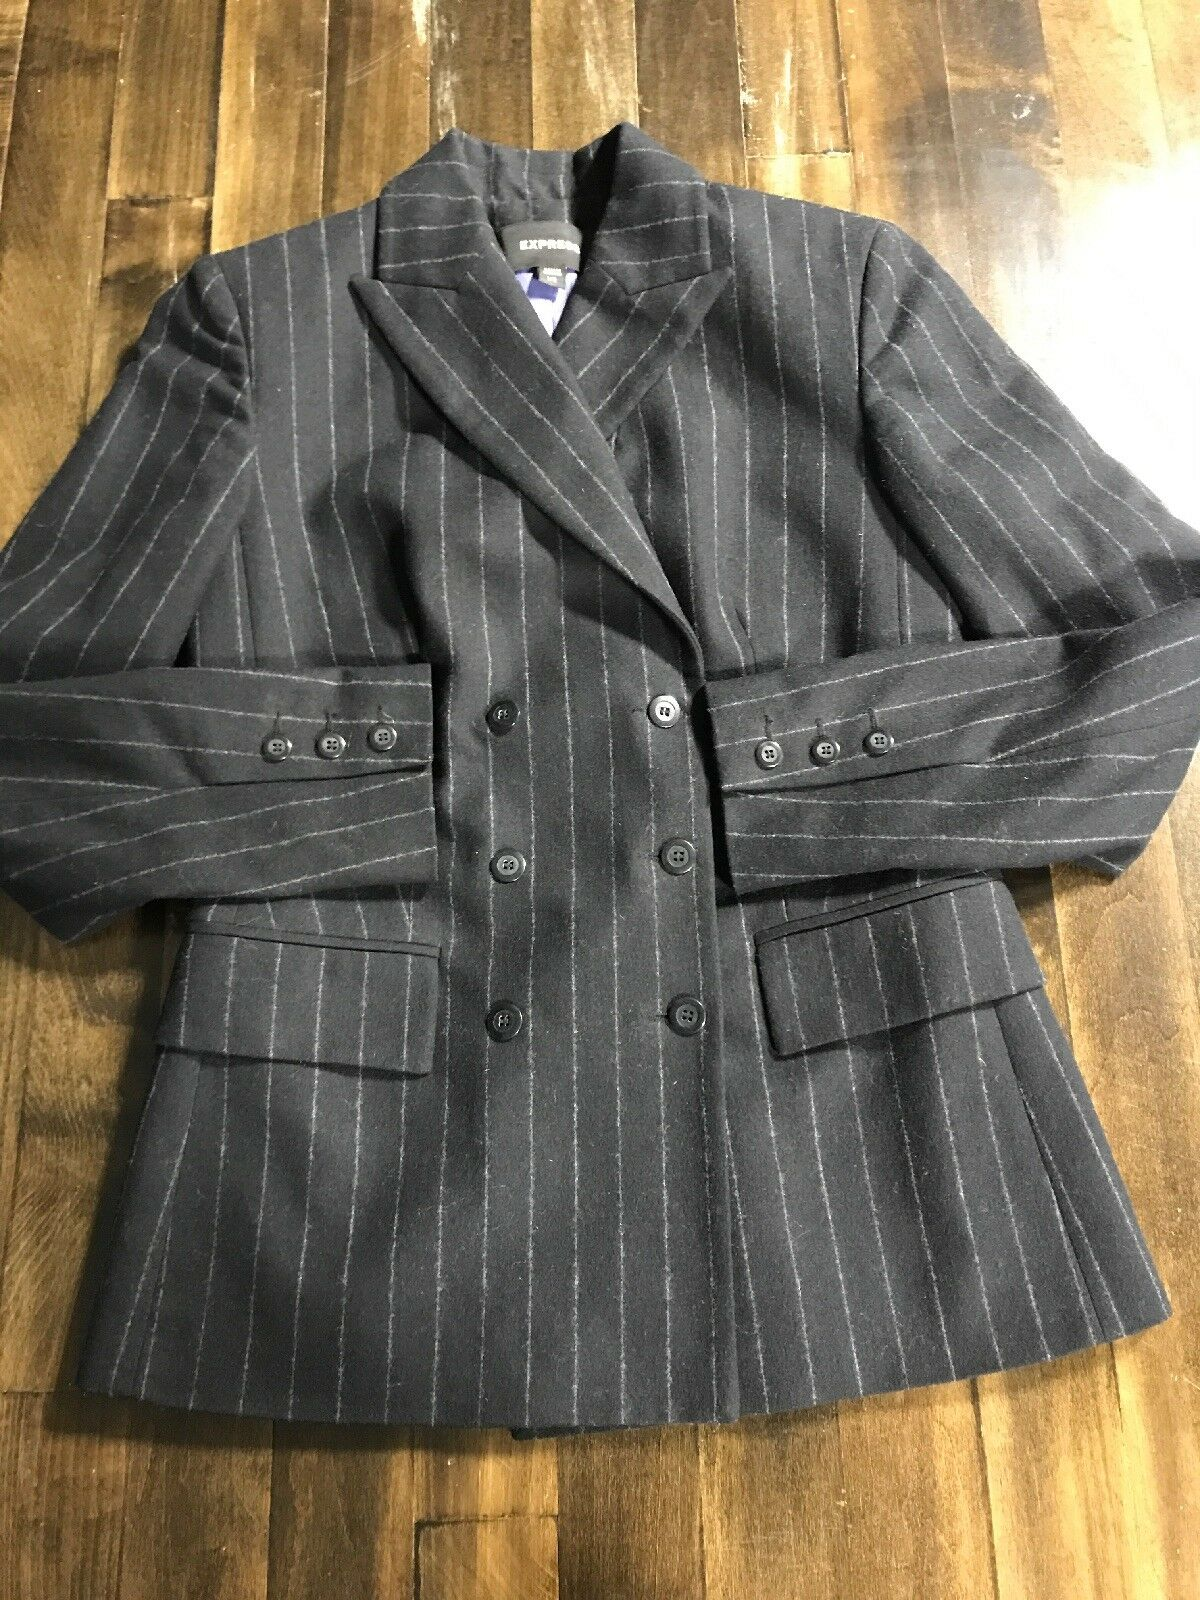 Express Women's Recycled Wool Blend Doublebreast Blazer Navy W Pintripe Size 1 2